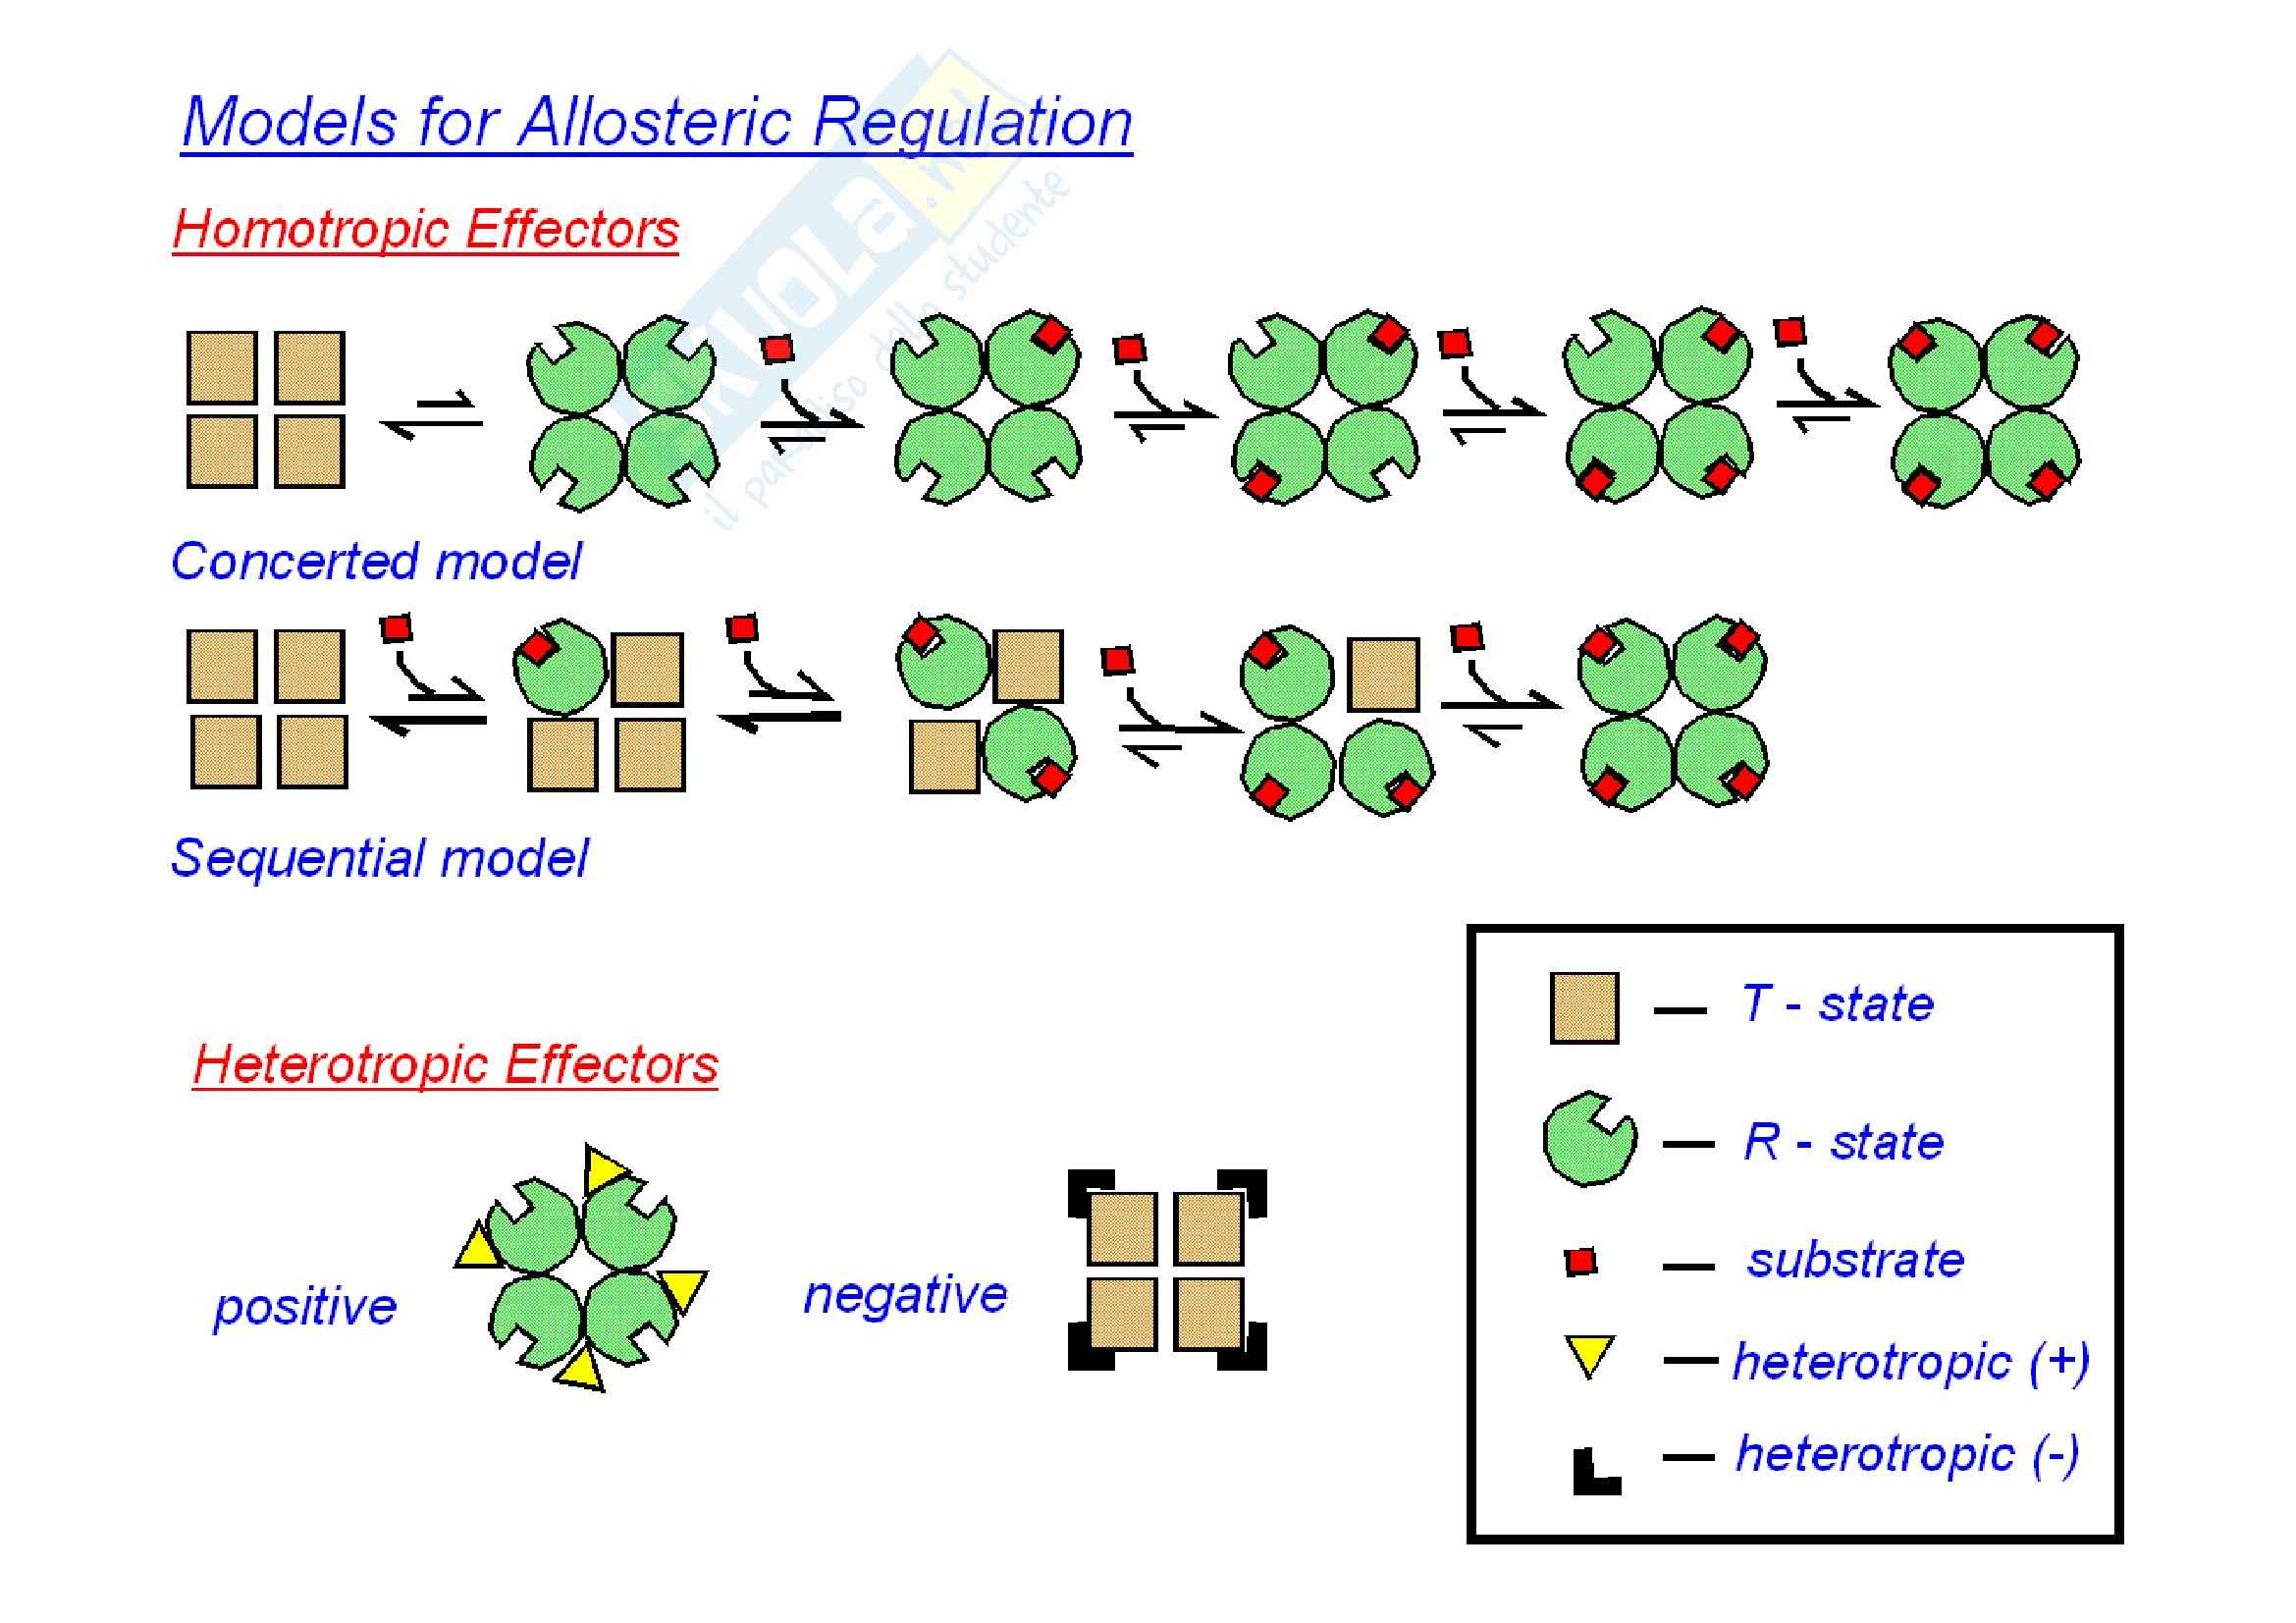 Enzimi allosterici Pag. 2